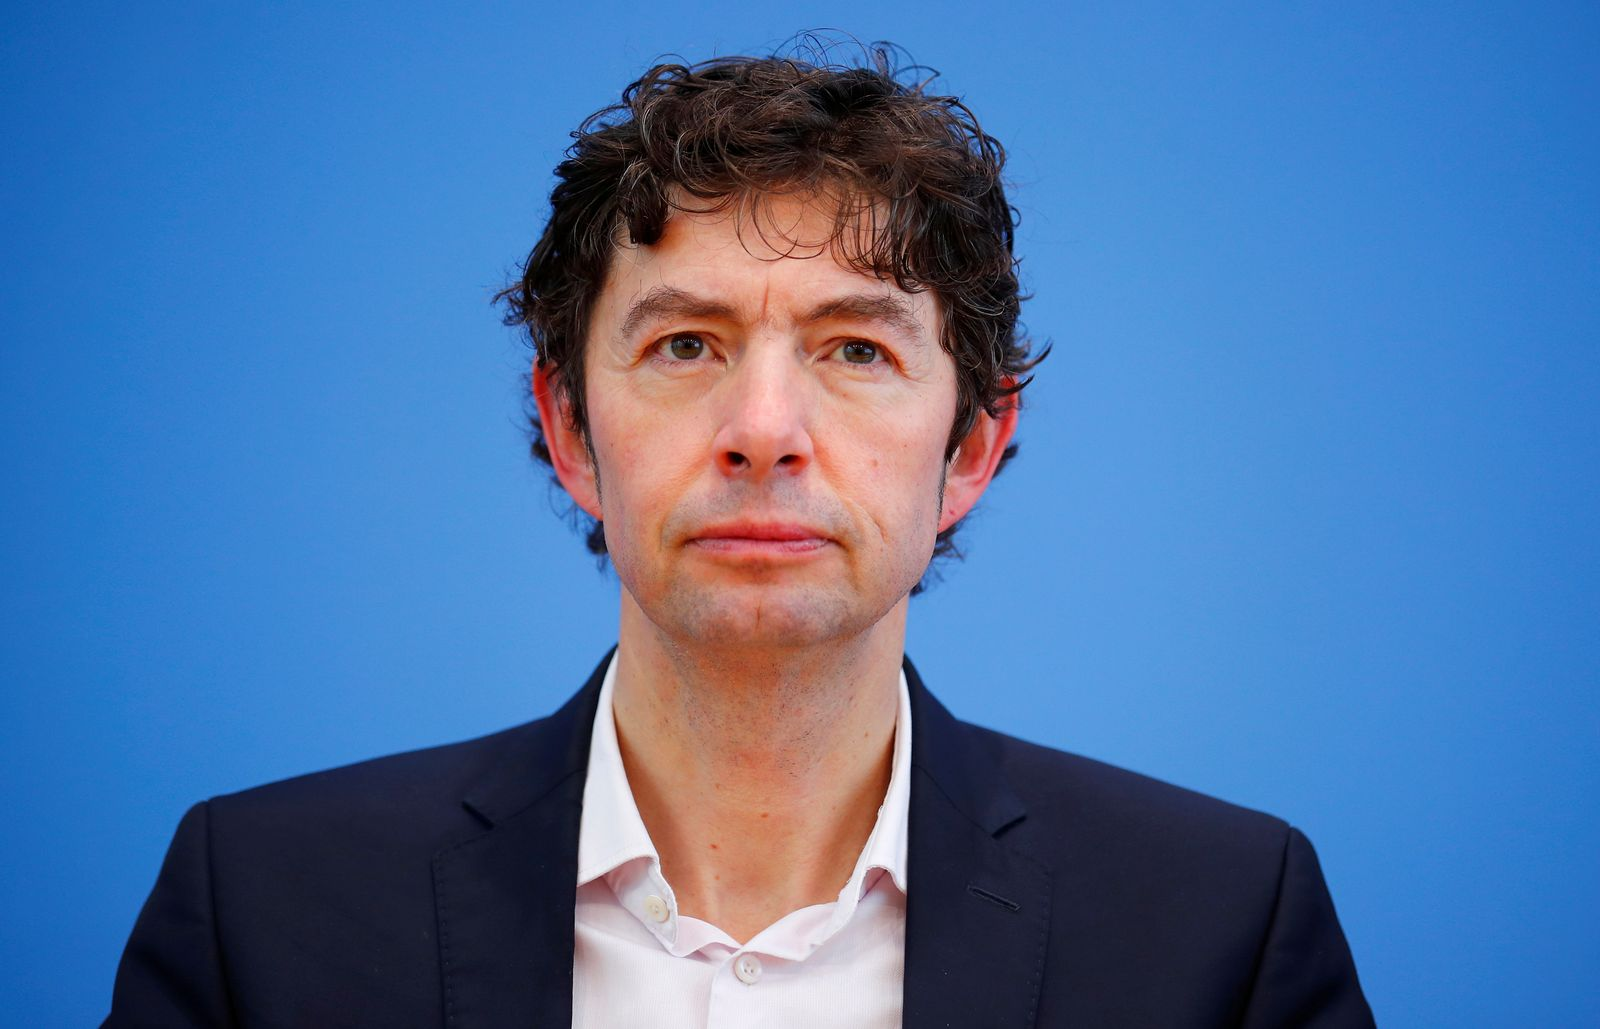 News conference to update on German coronavirus spread in Berlin